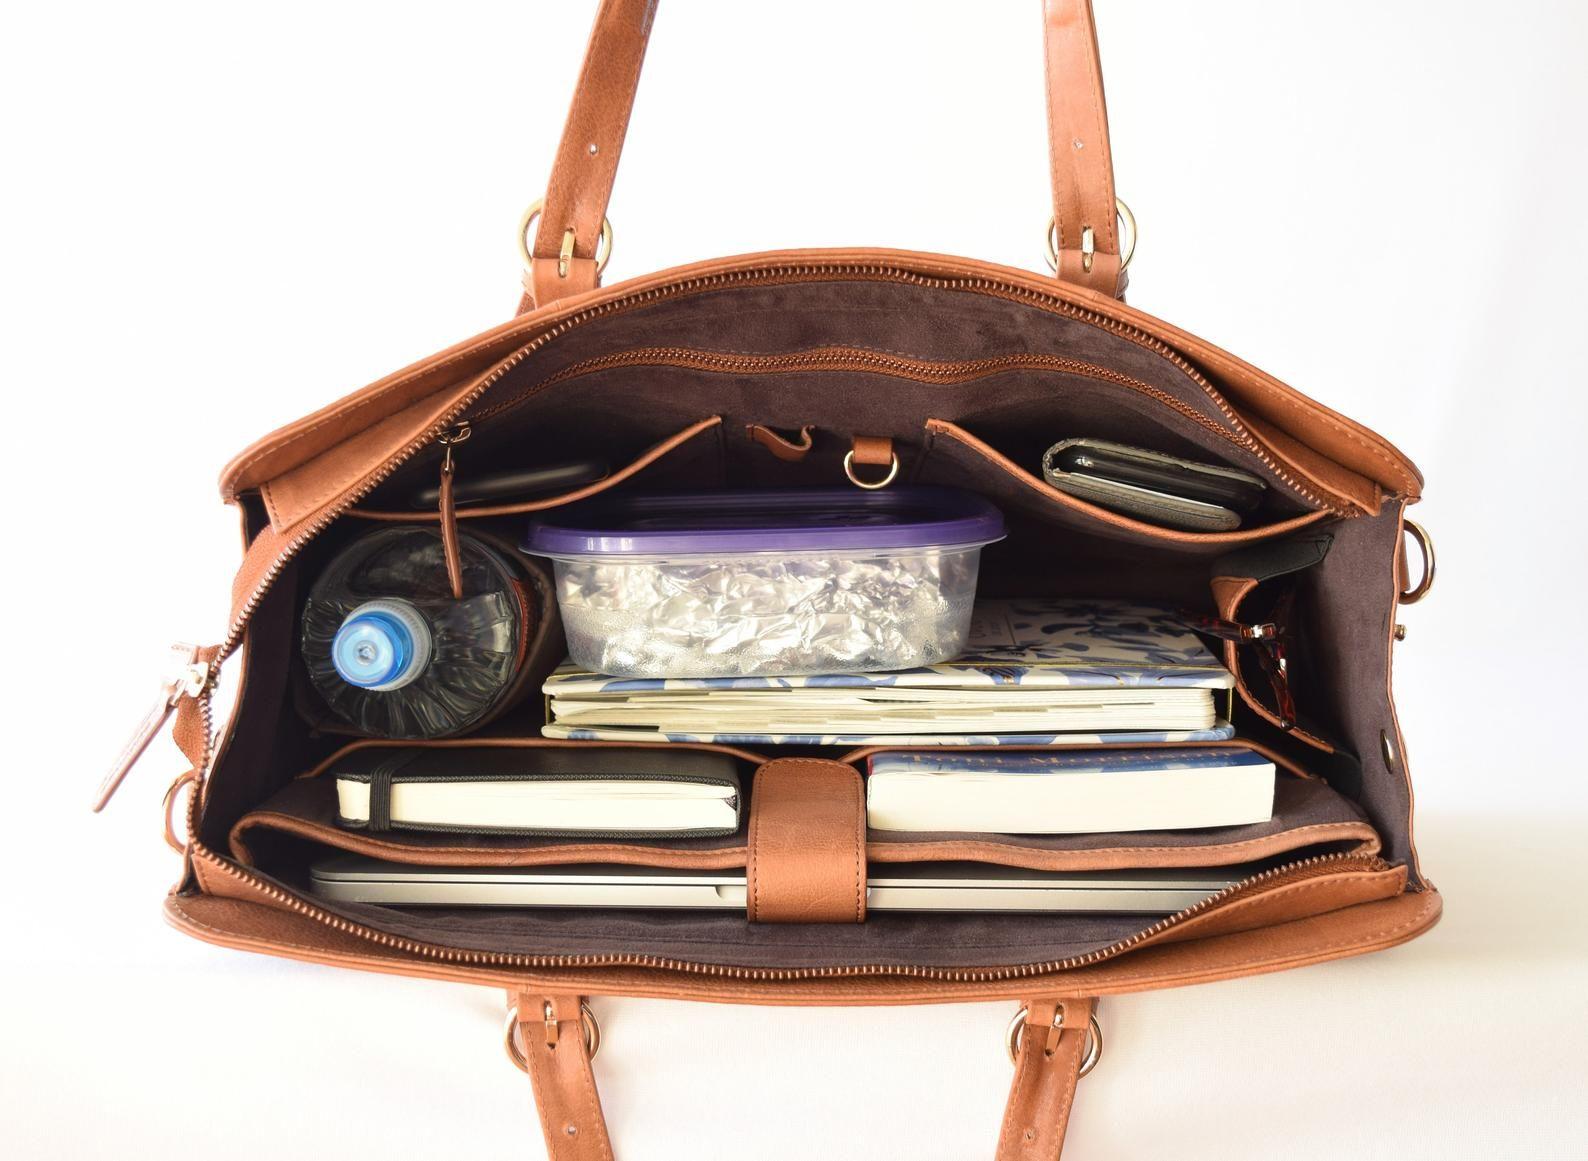 Laptop Bags Women Leather Laptop Bag 15 Inch Macbook Etsy Laptop Bag For Women Leather Laptop Bag Laptop Bag